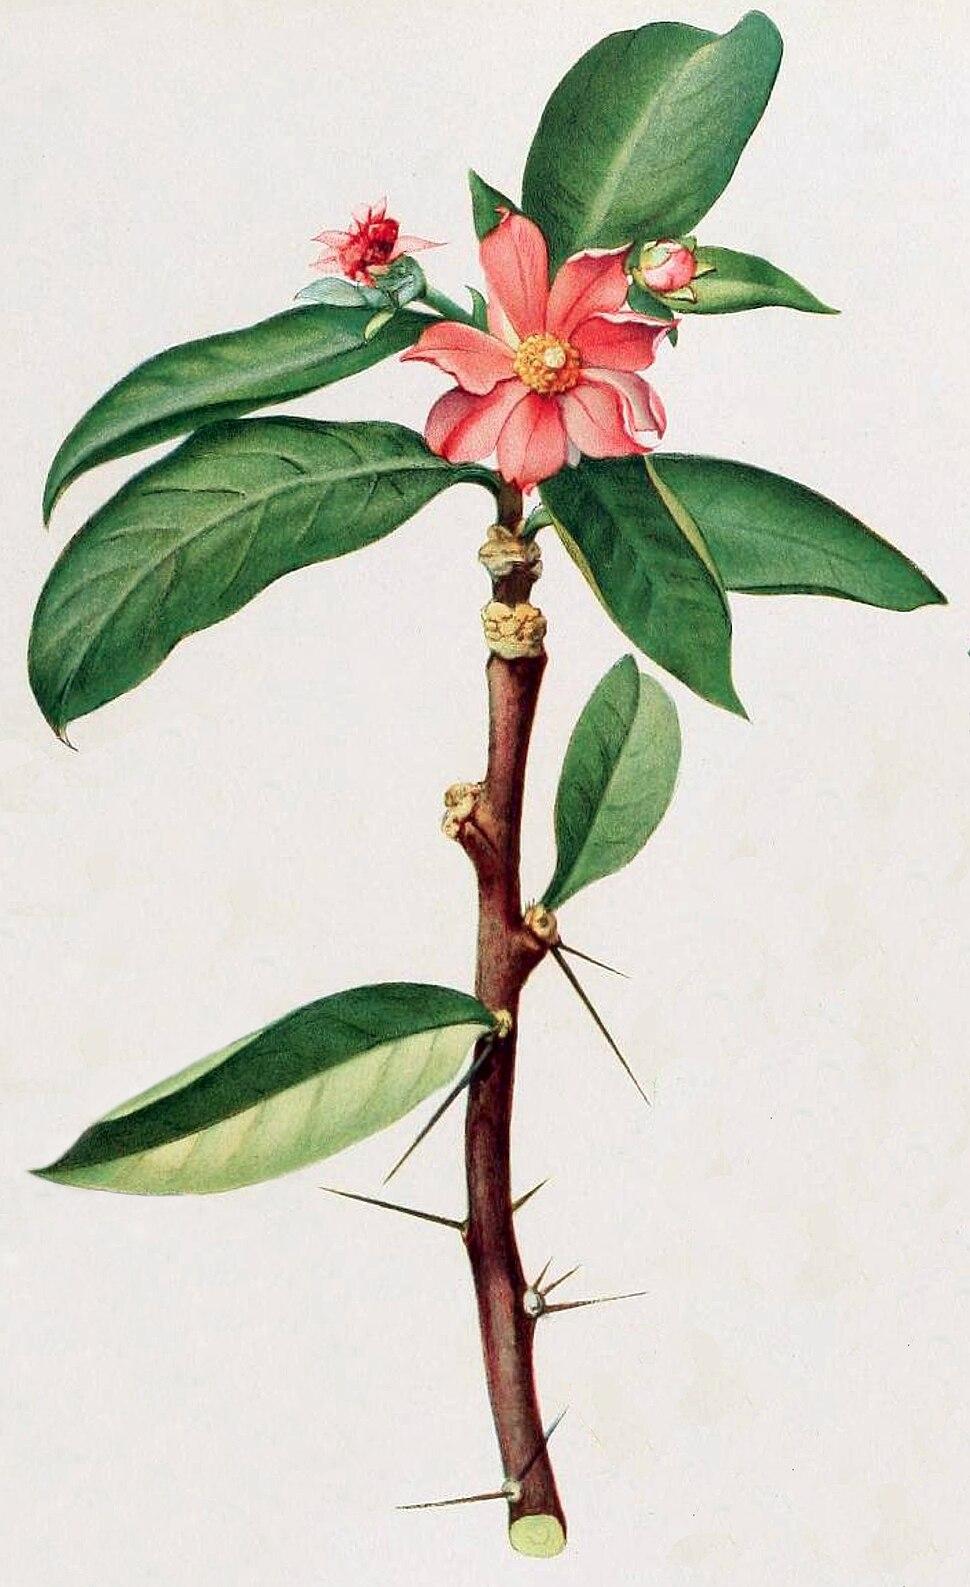 Britton & Rose Vol 1 Plate III (Pereskia grandifolia)